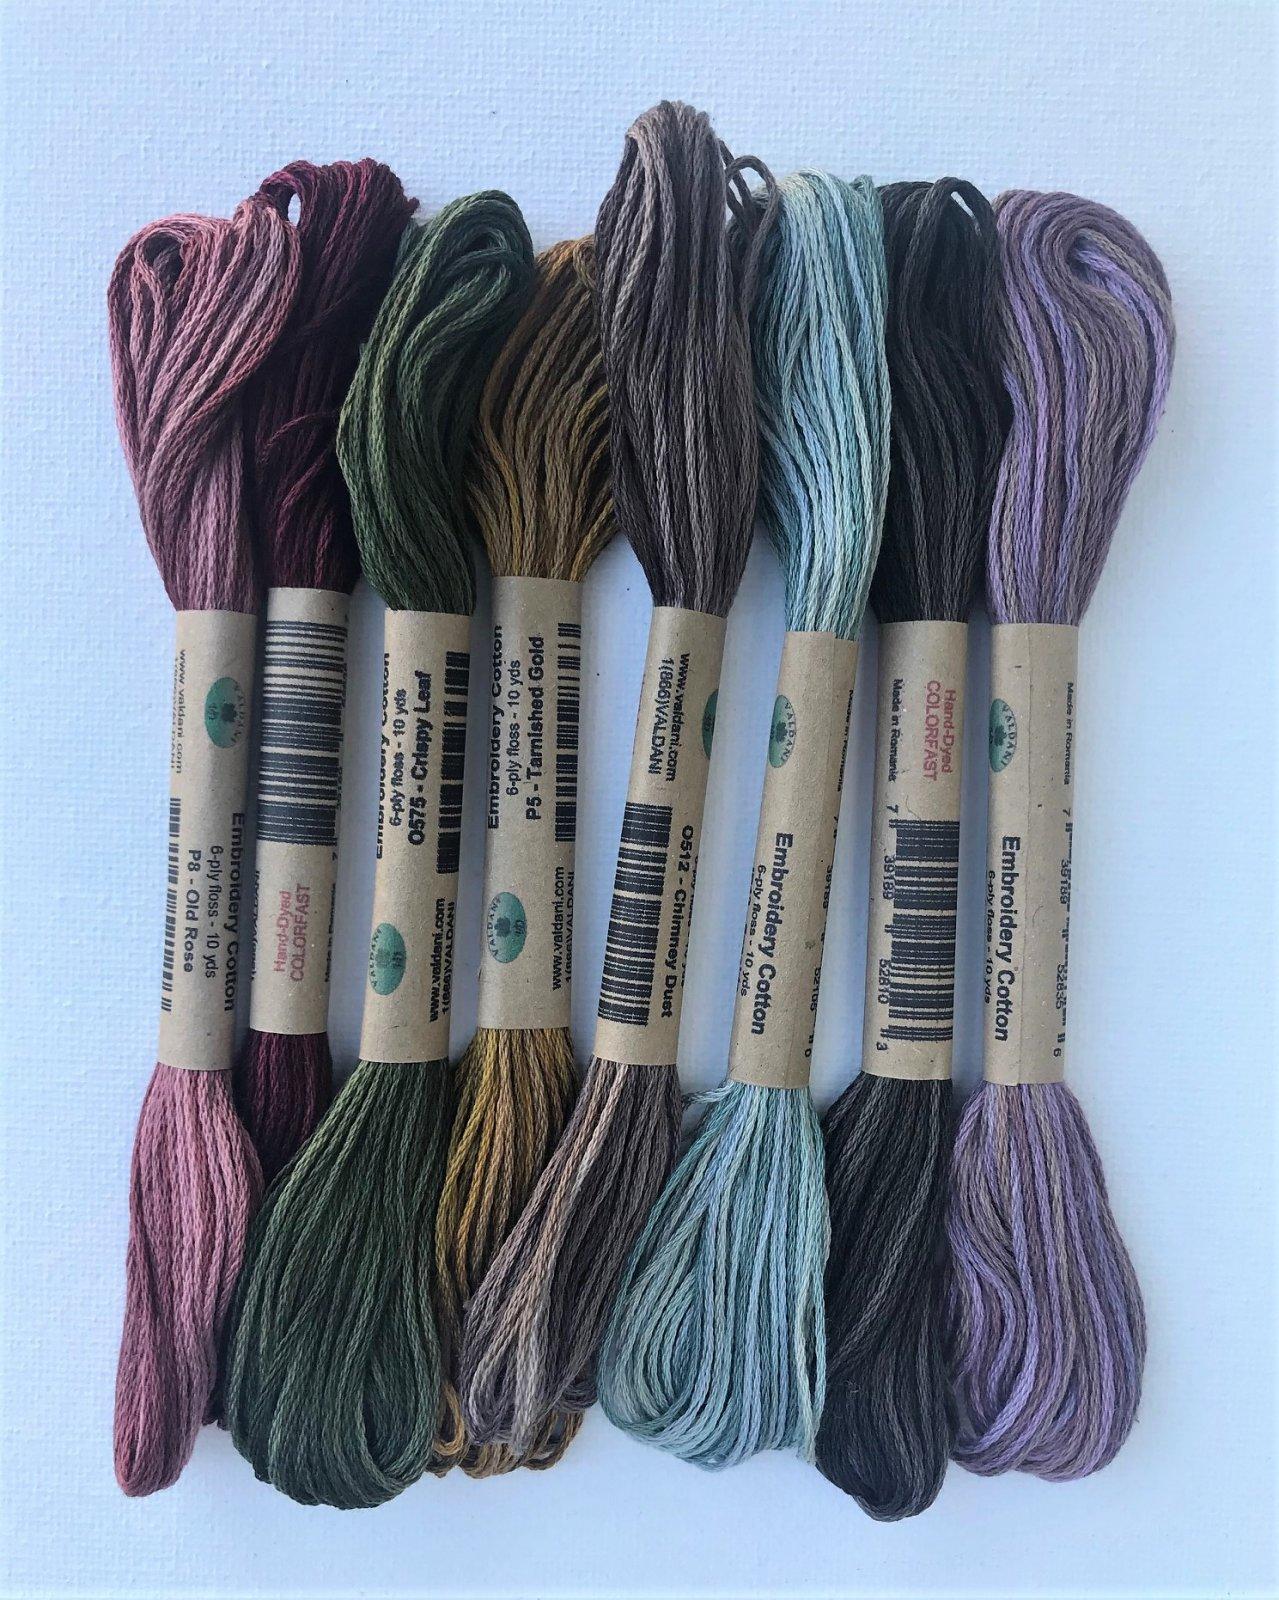 Bless our Home Drawstring Bag - Valdani thread pack